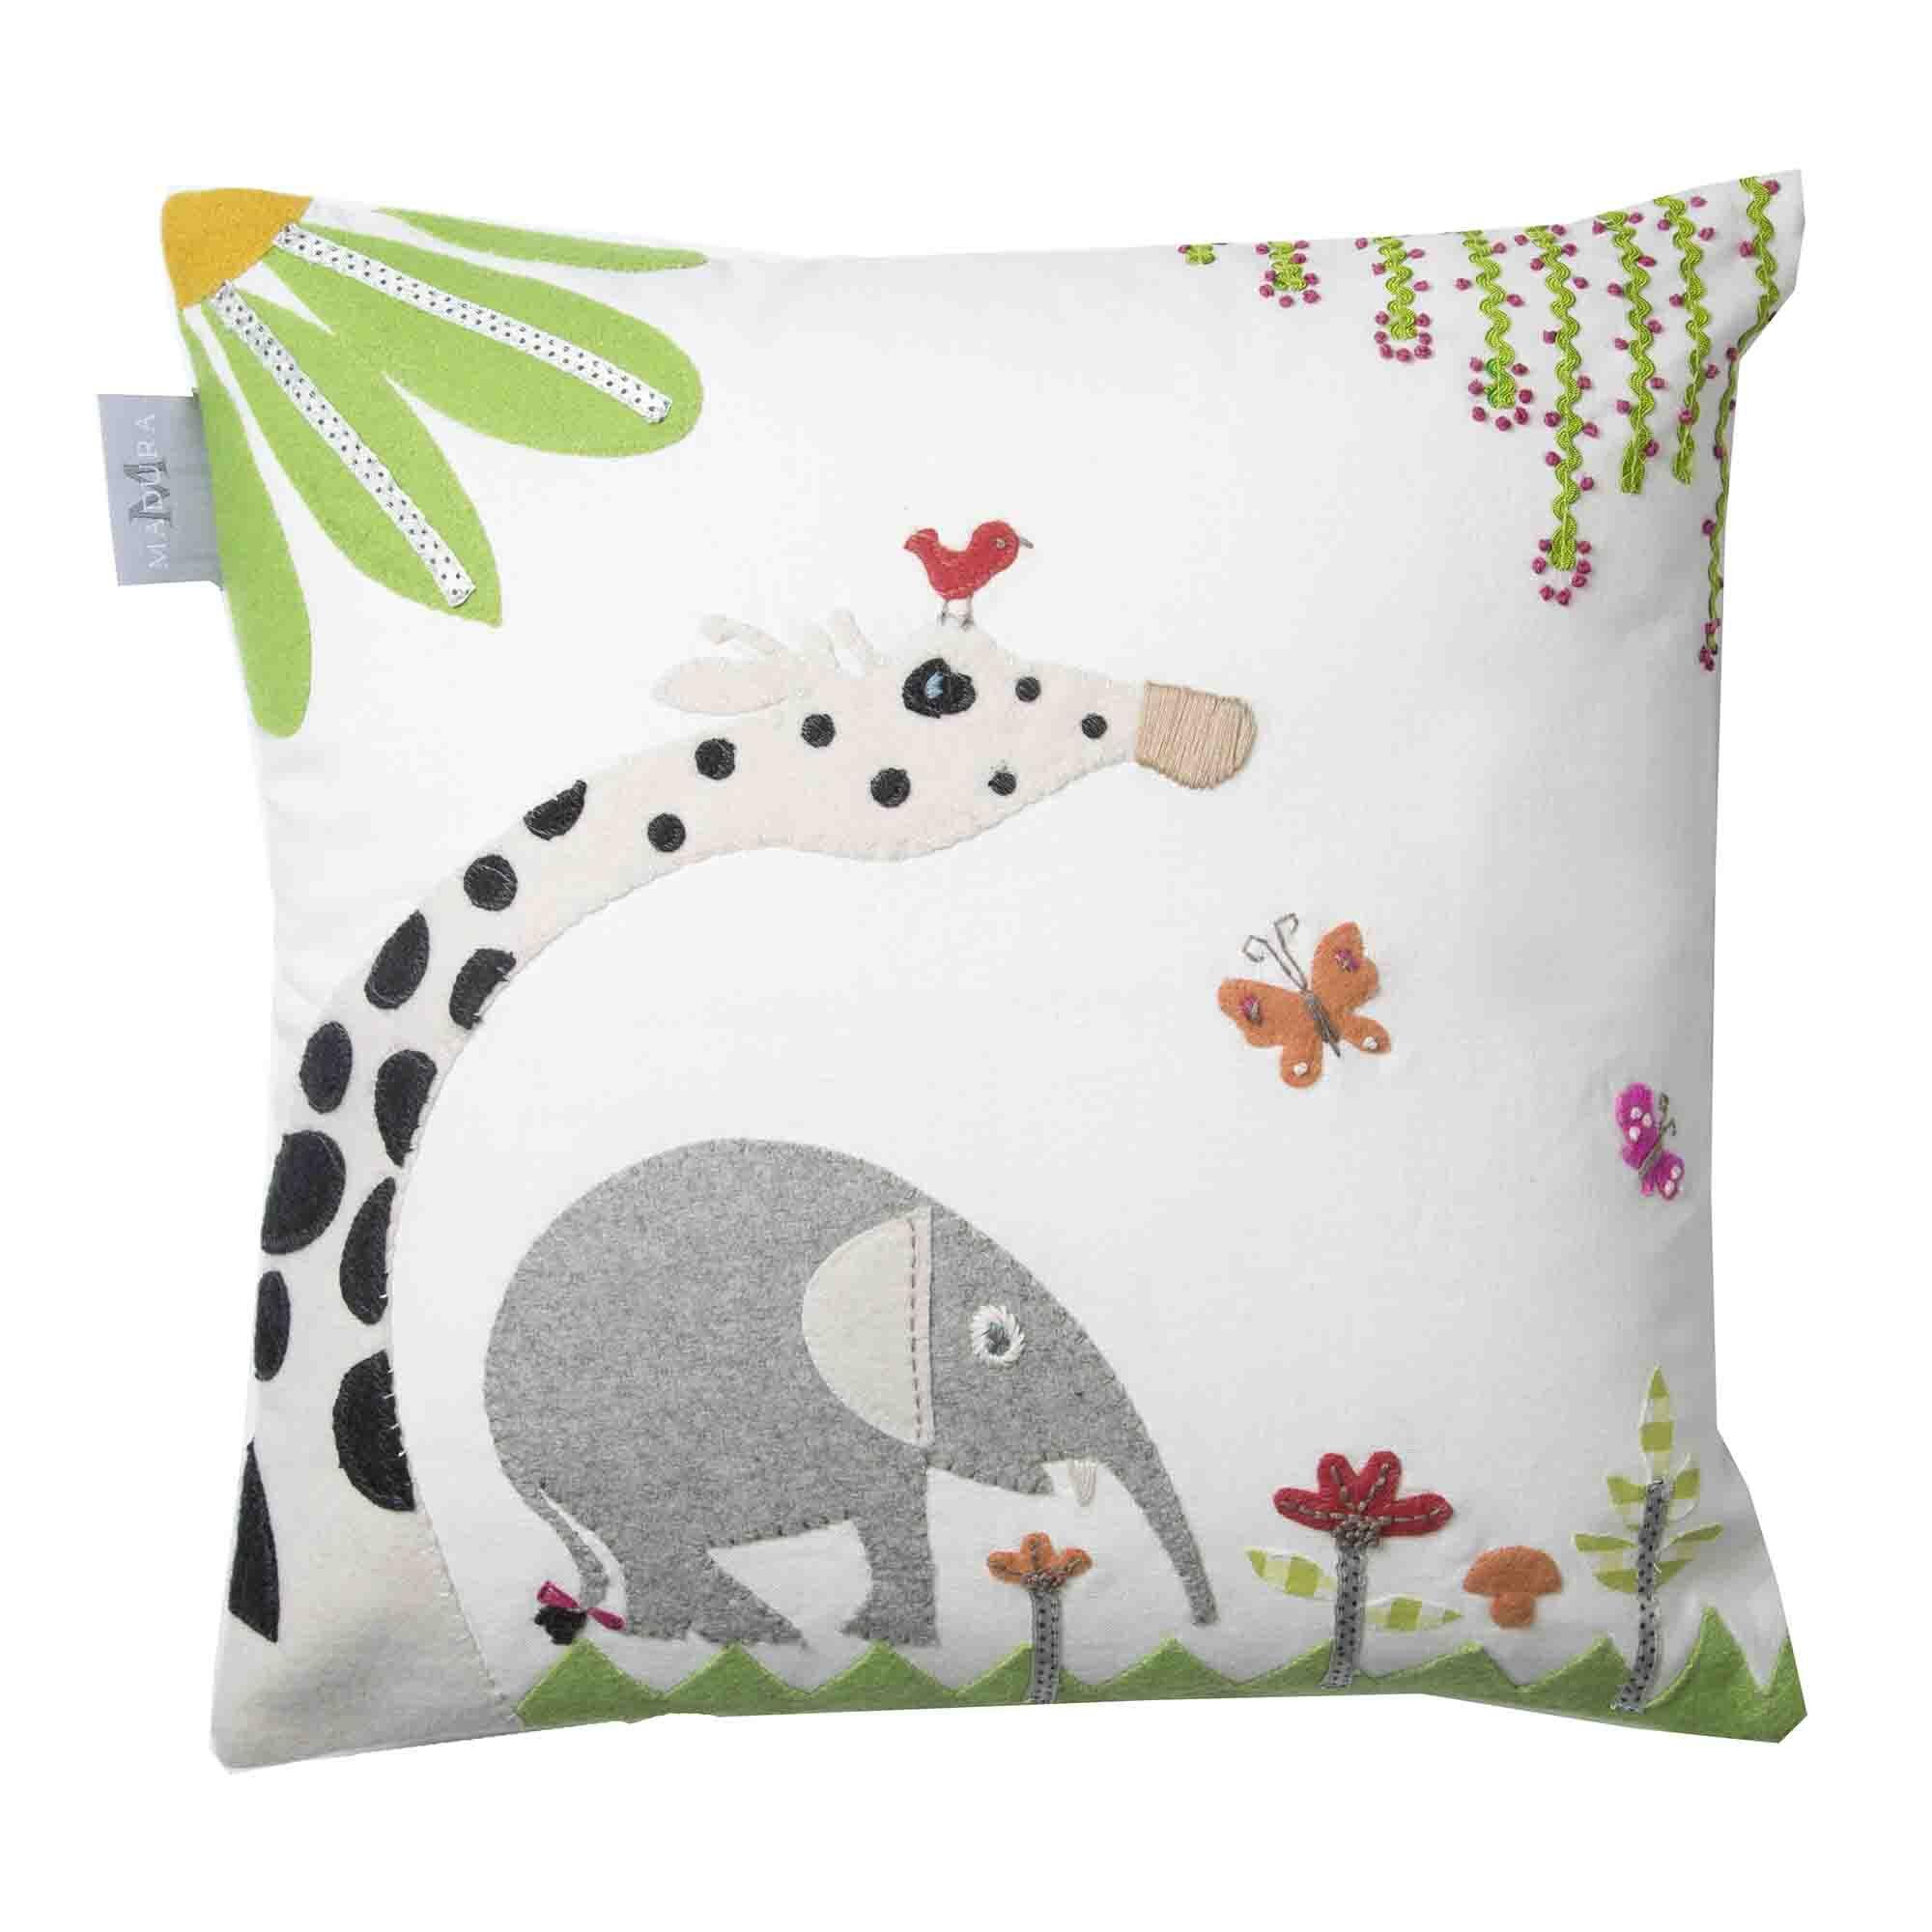 Jungle Cotton Pillow Cover